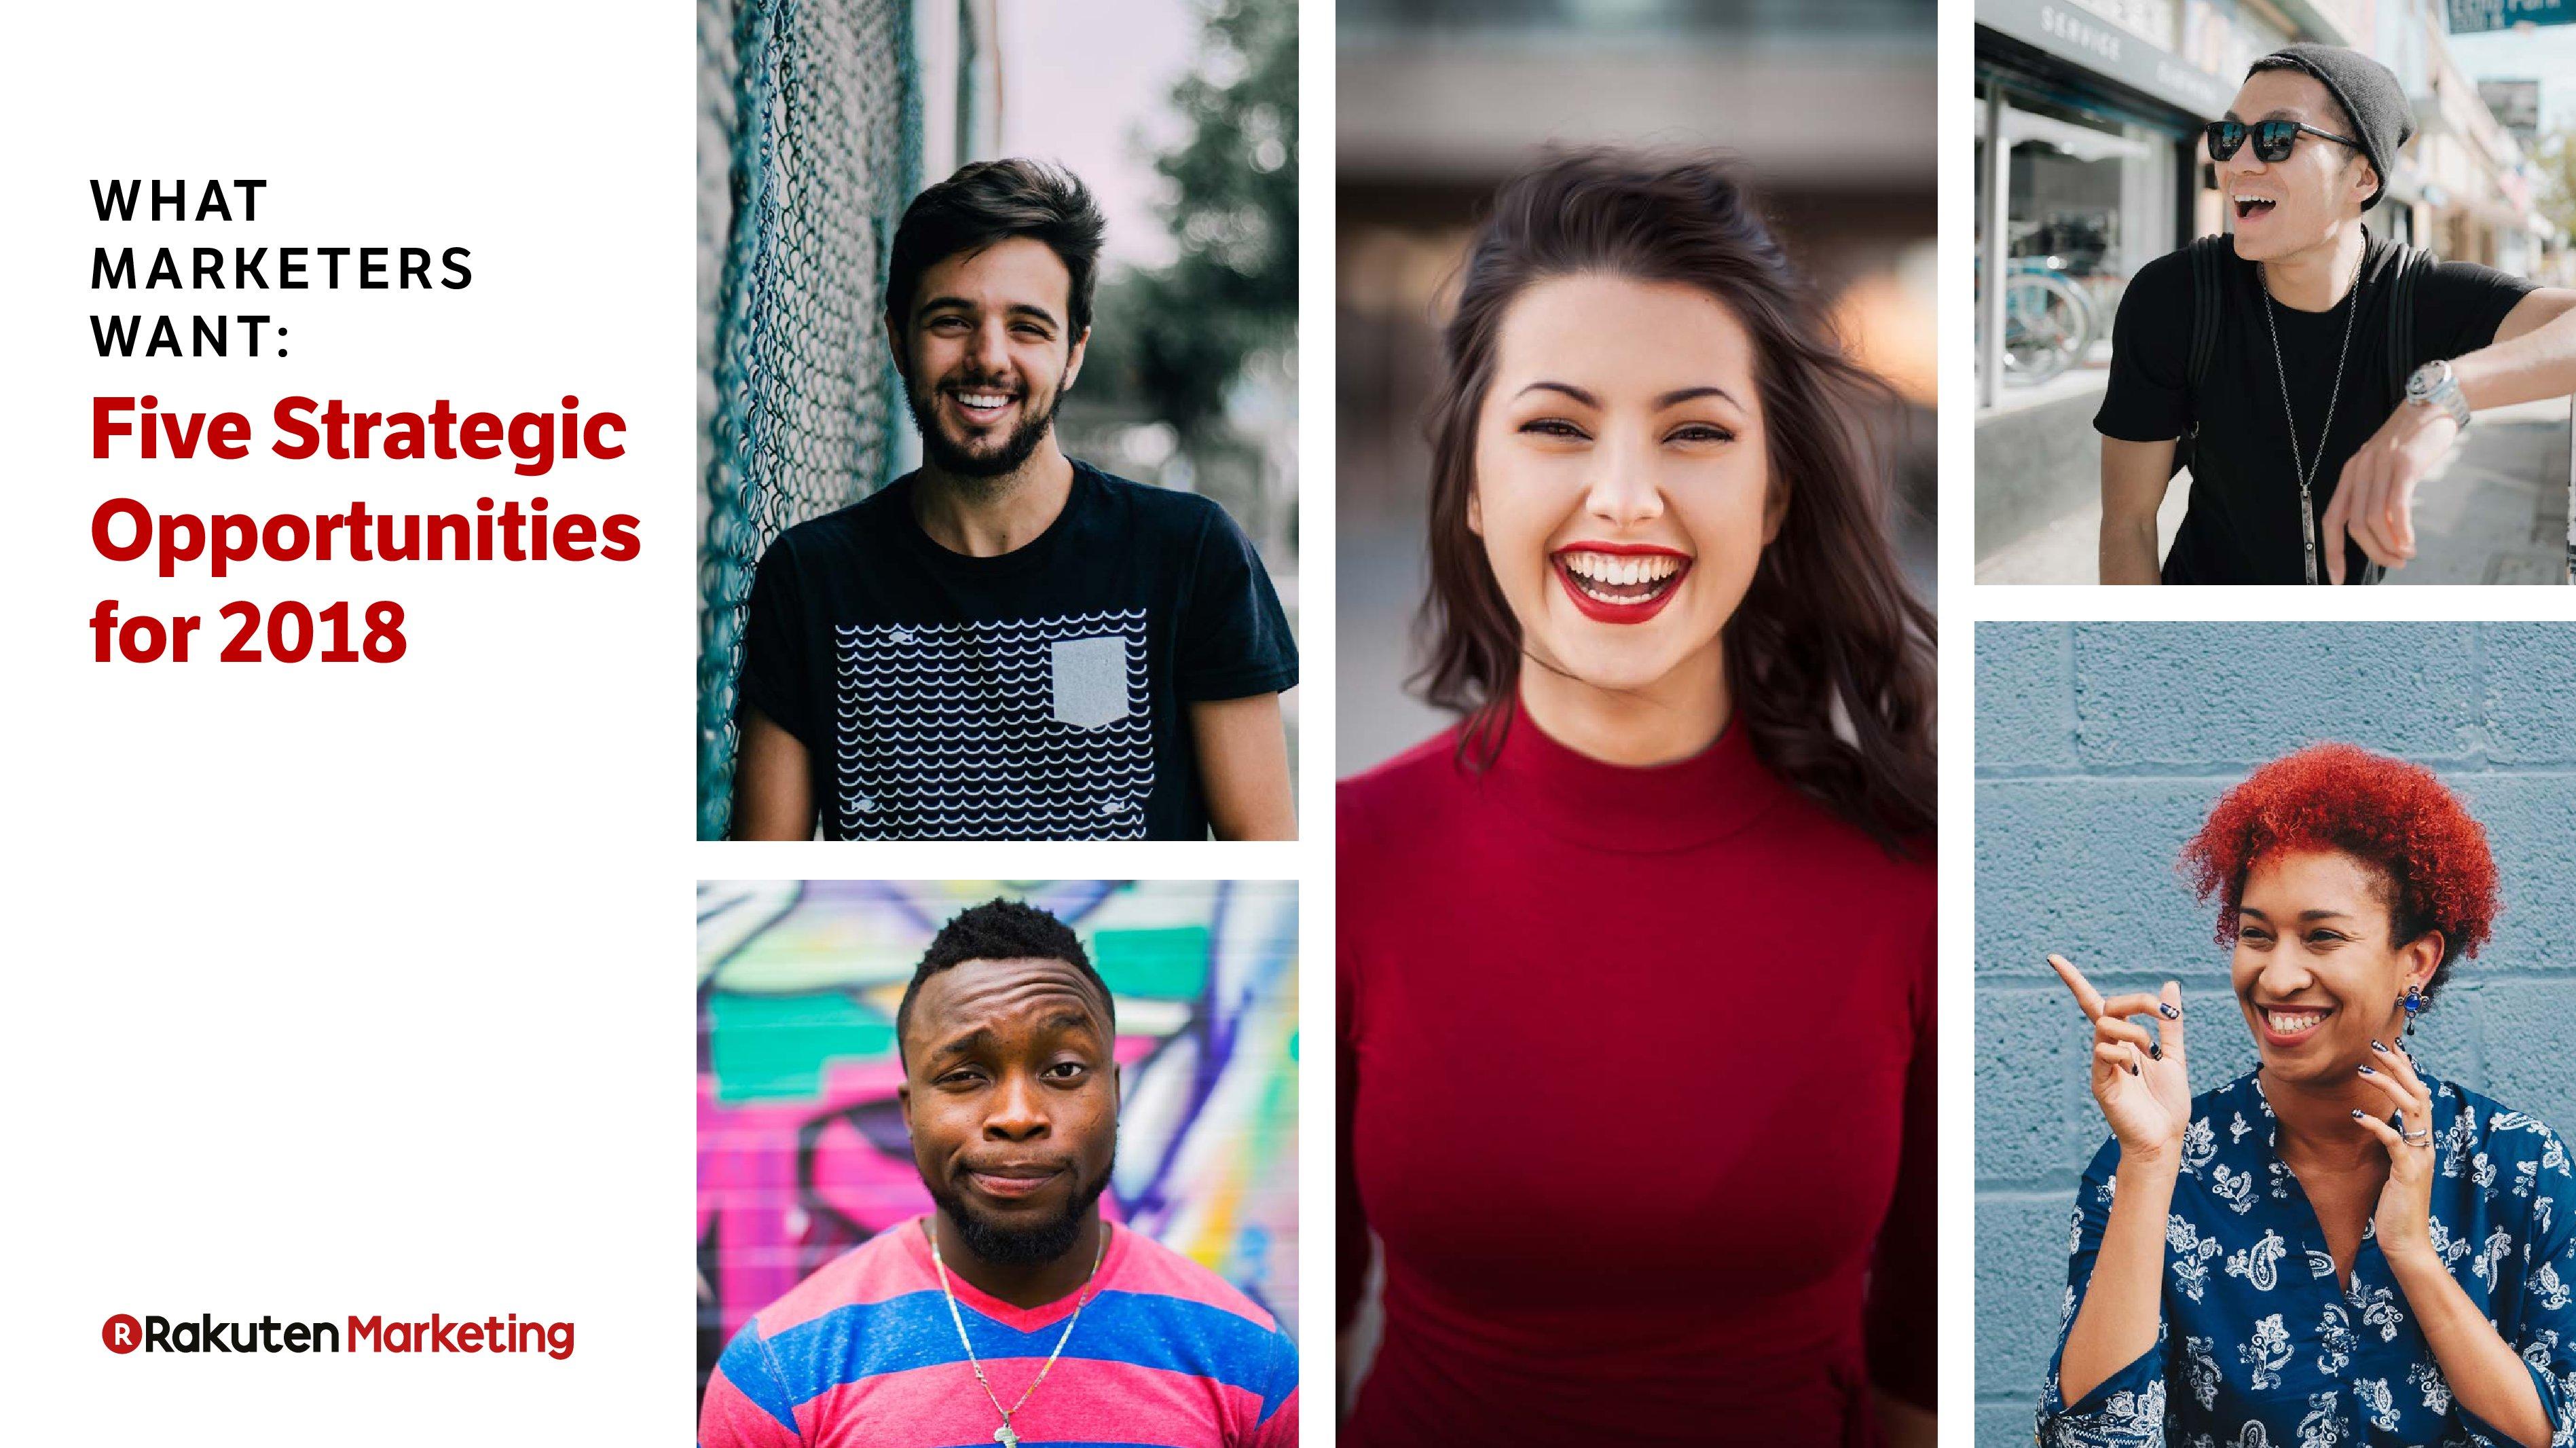 RakutenMarketing:2018年营销人员最关注的五大领域